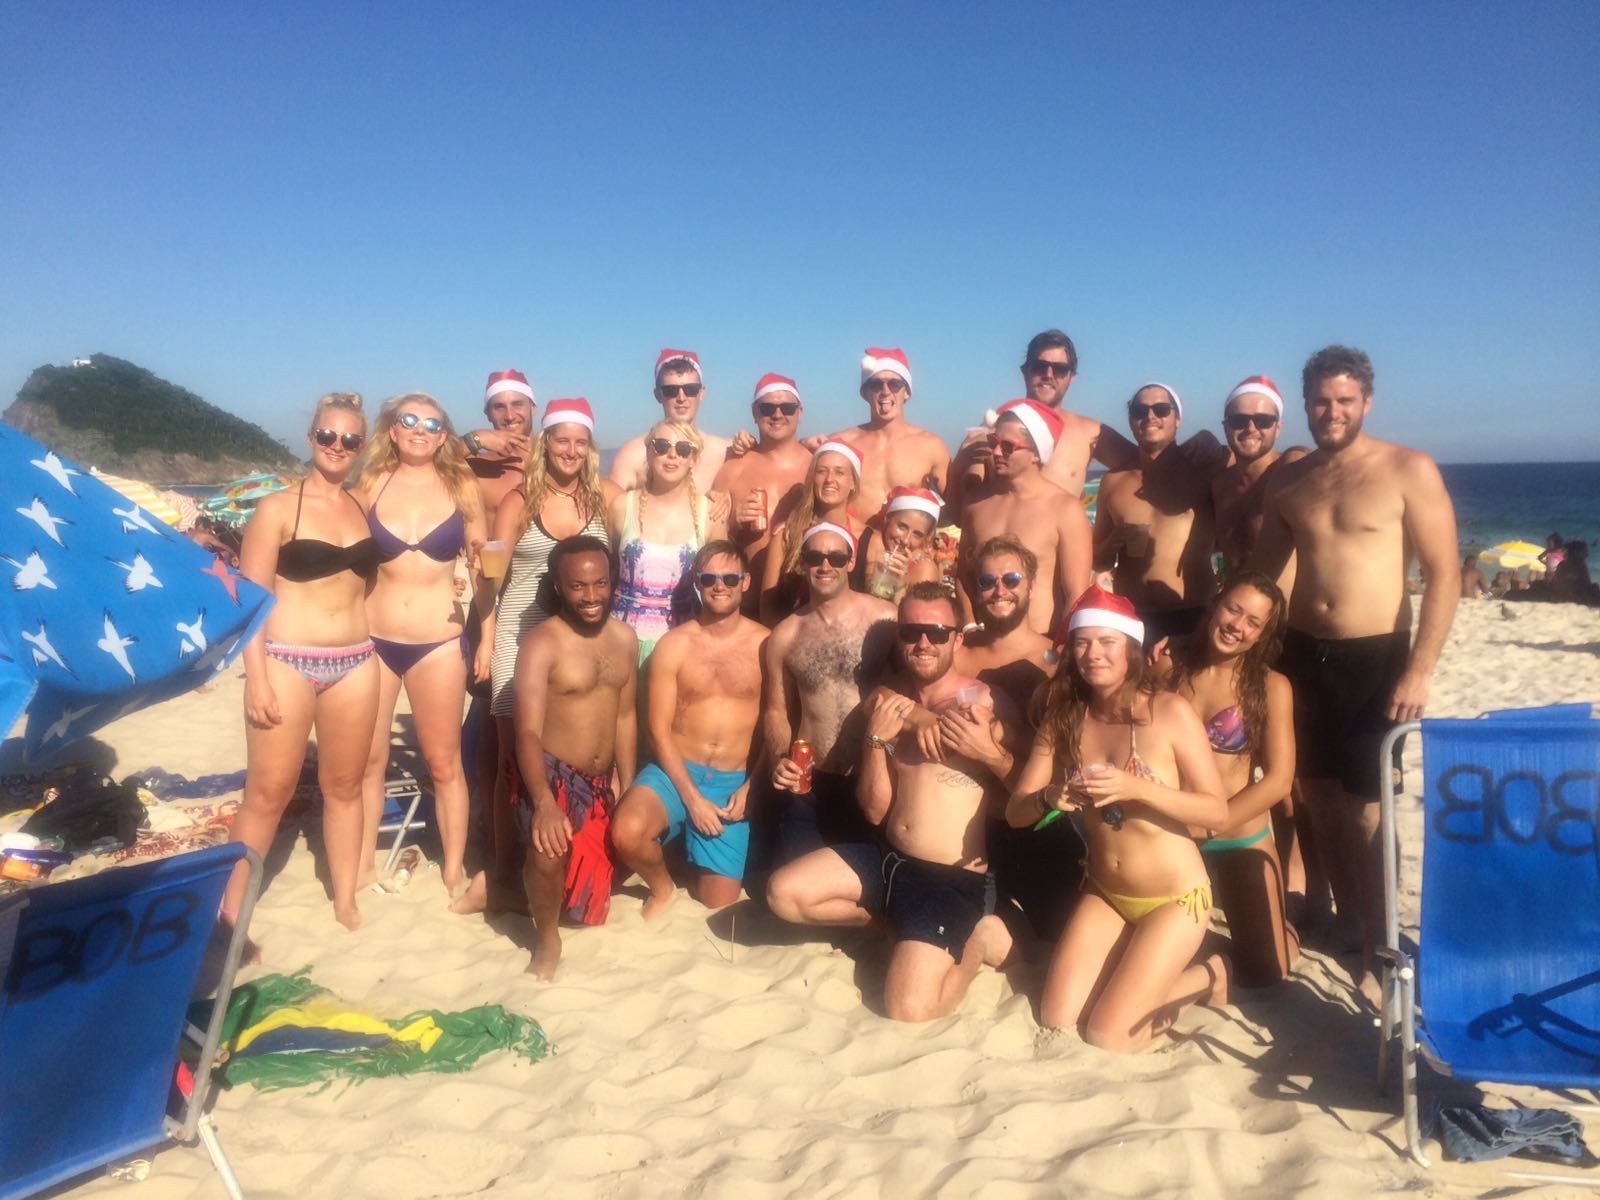 David Simpson and friends spending Christmas day at the Copacabana beach in Rio de Janeiro, Brazil. Friends, steak & Copacabana, a perfect Christmas in Rio